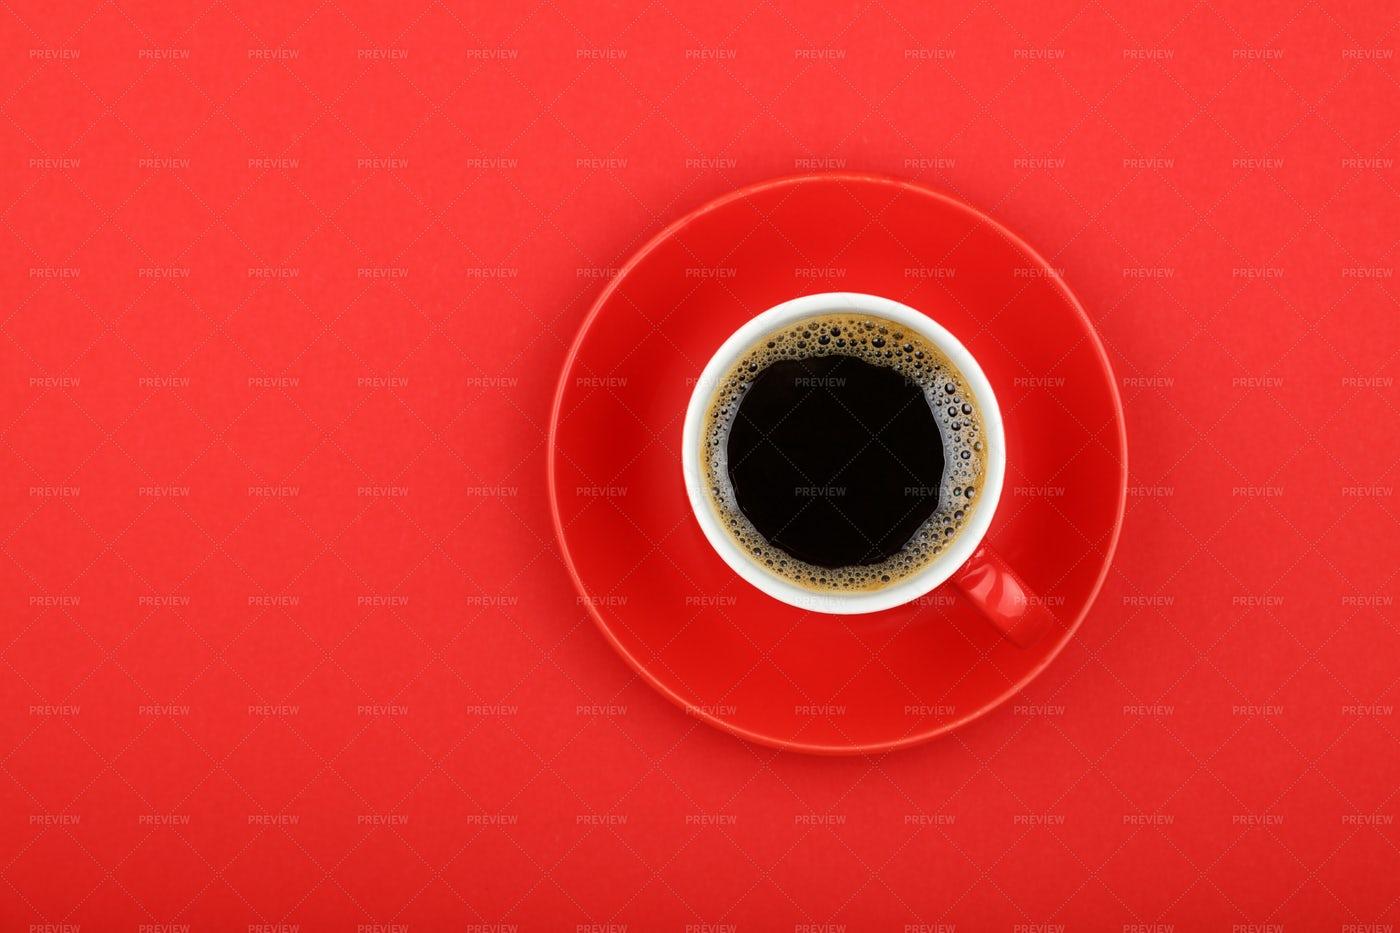 Black Coffee: Stock Photos